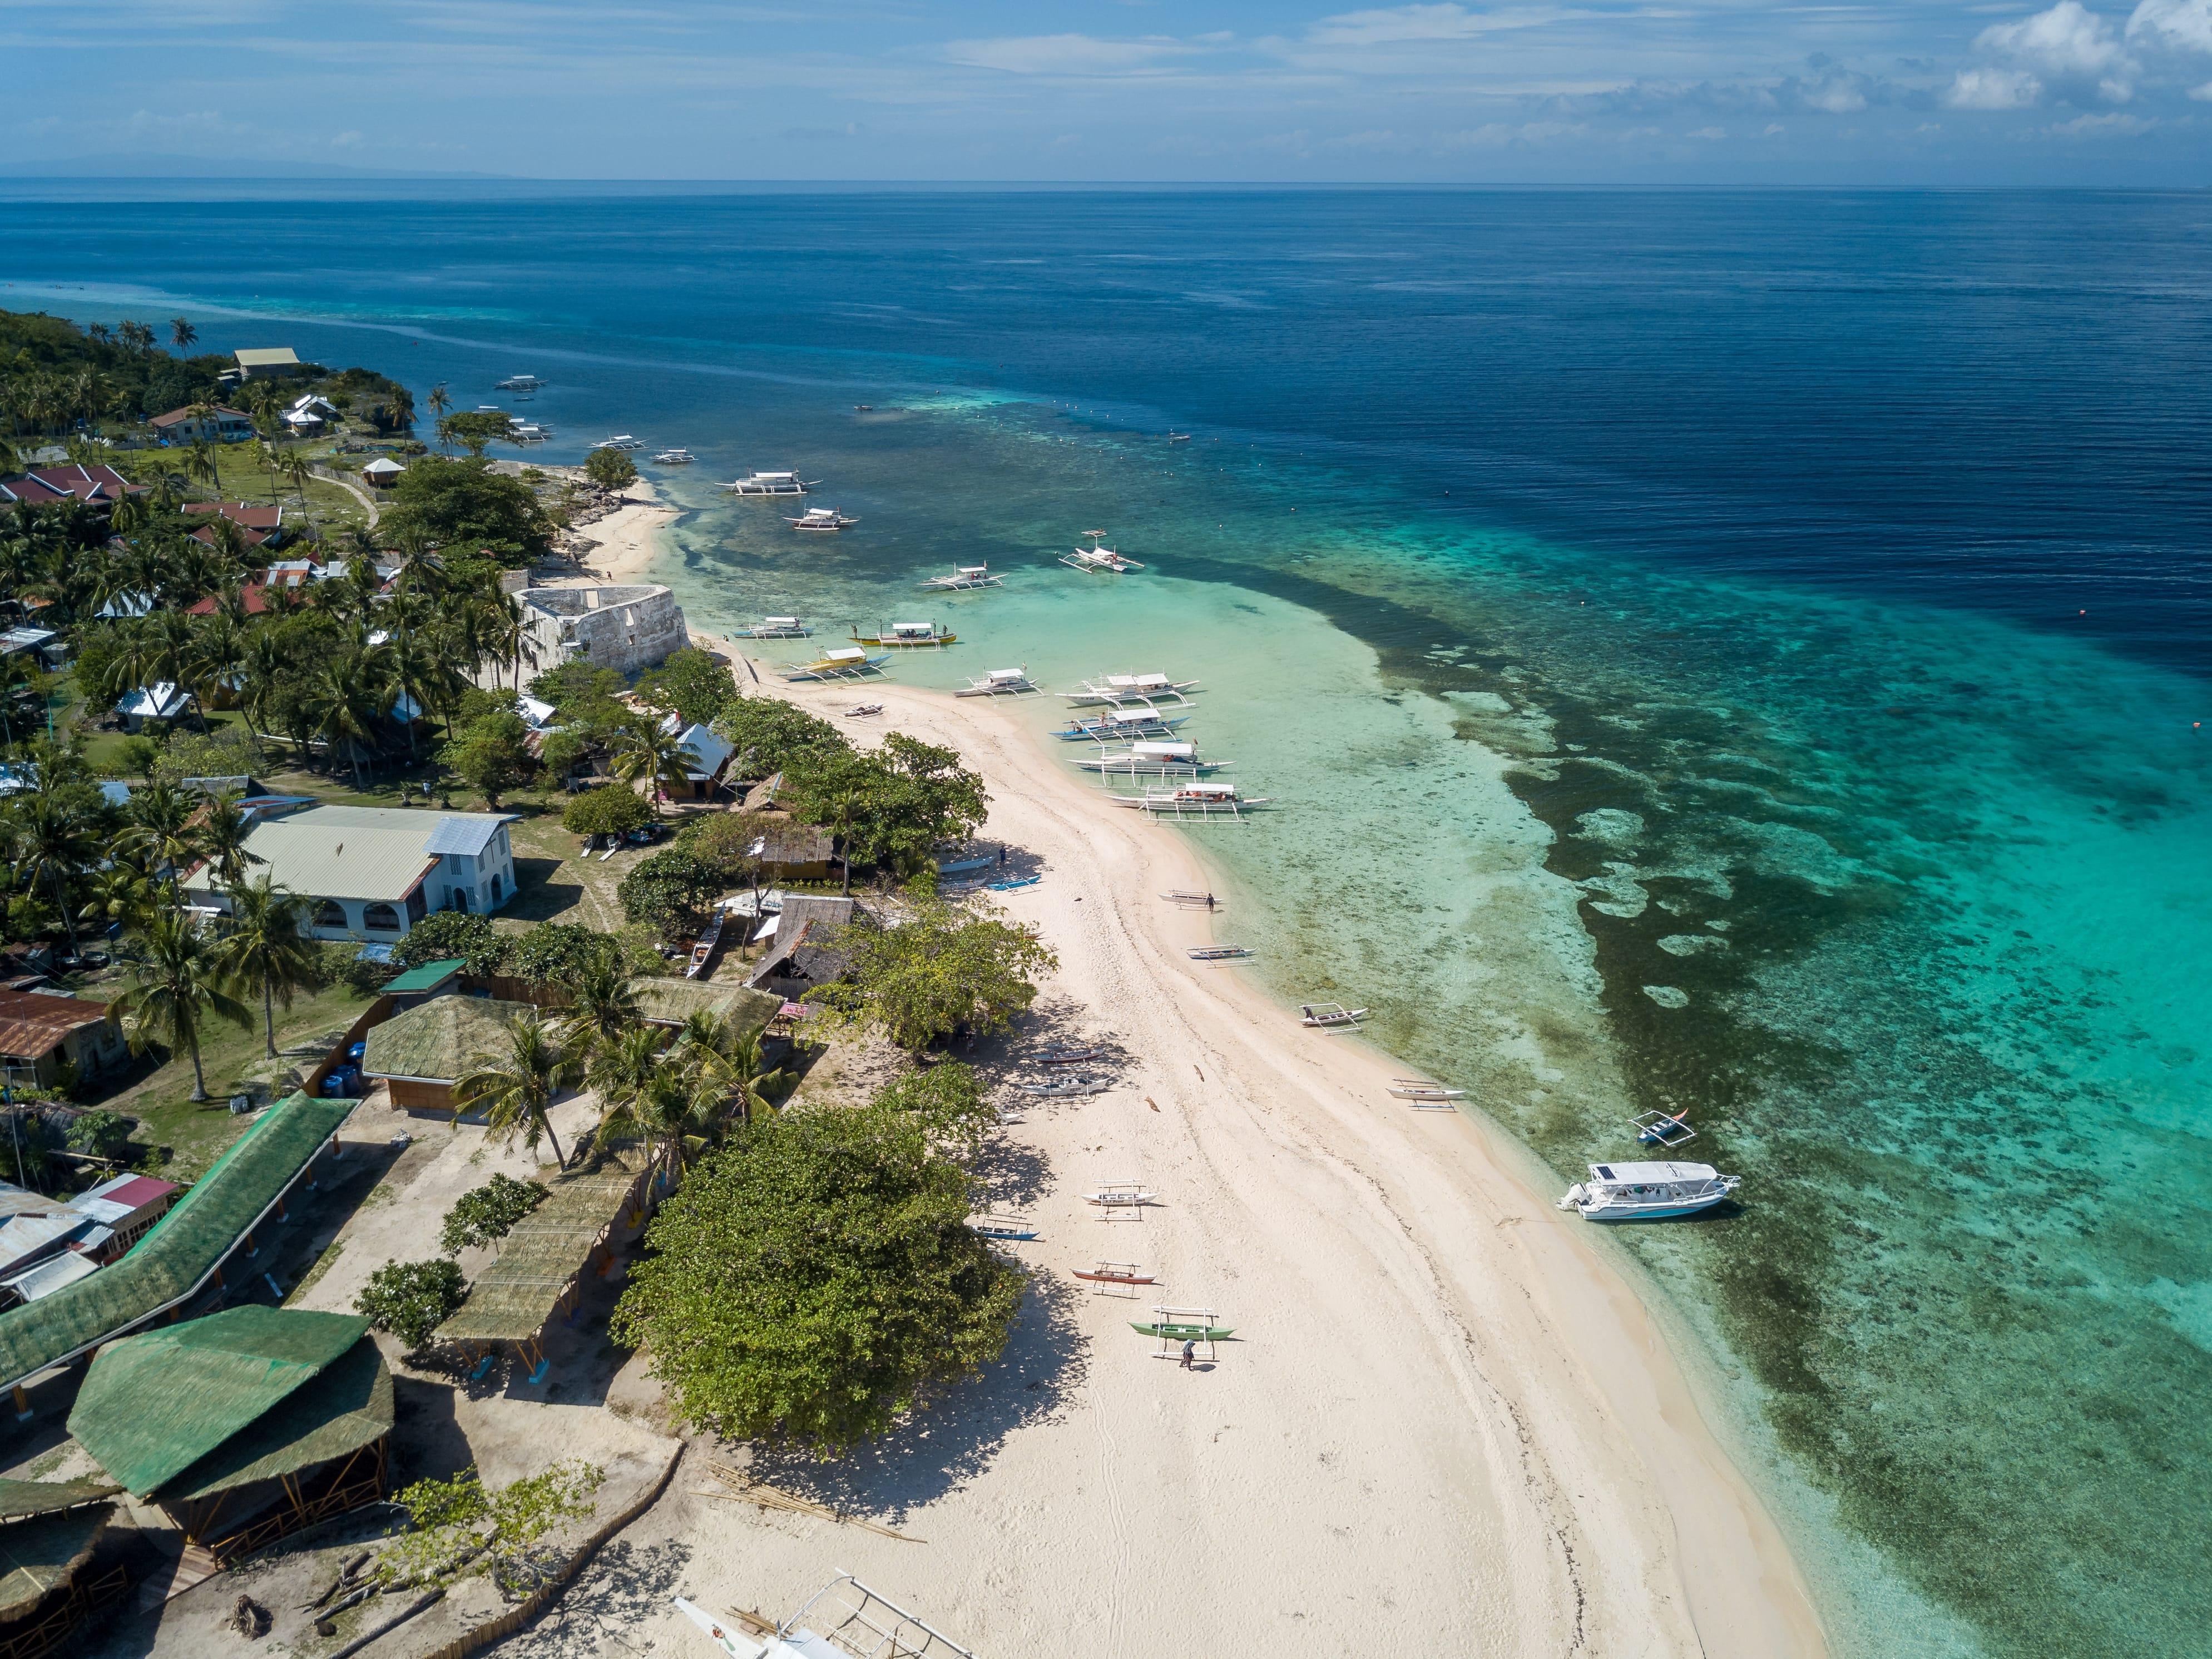 Beautiful white sand beach at Pamilacan Island in Bohol